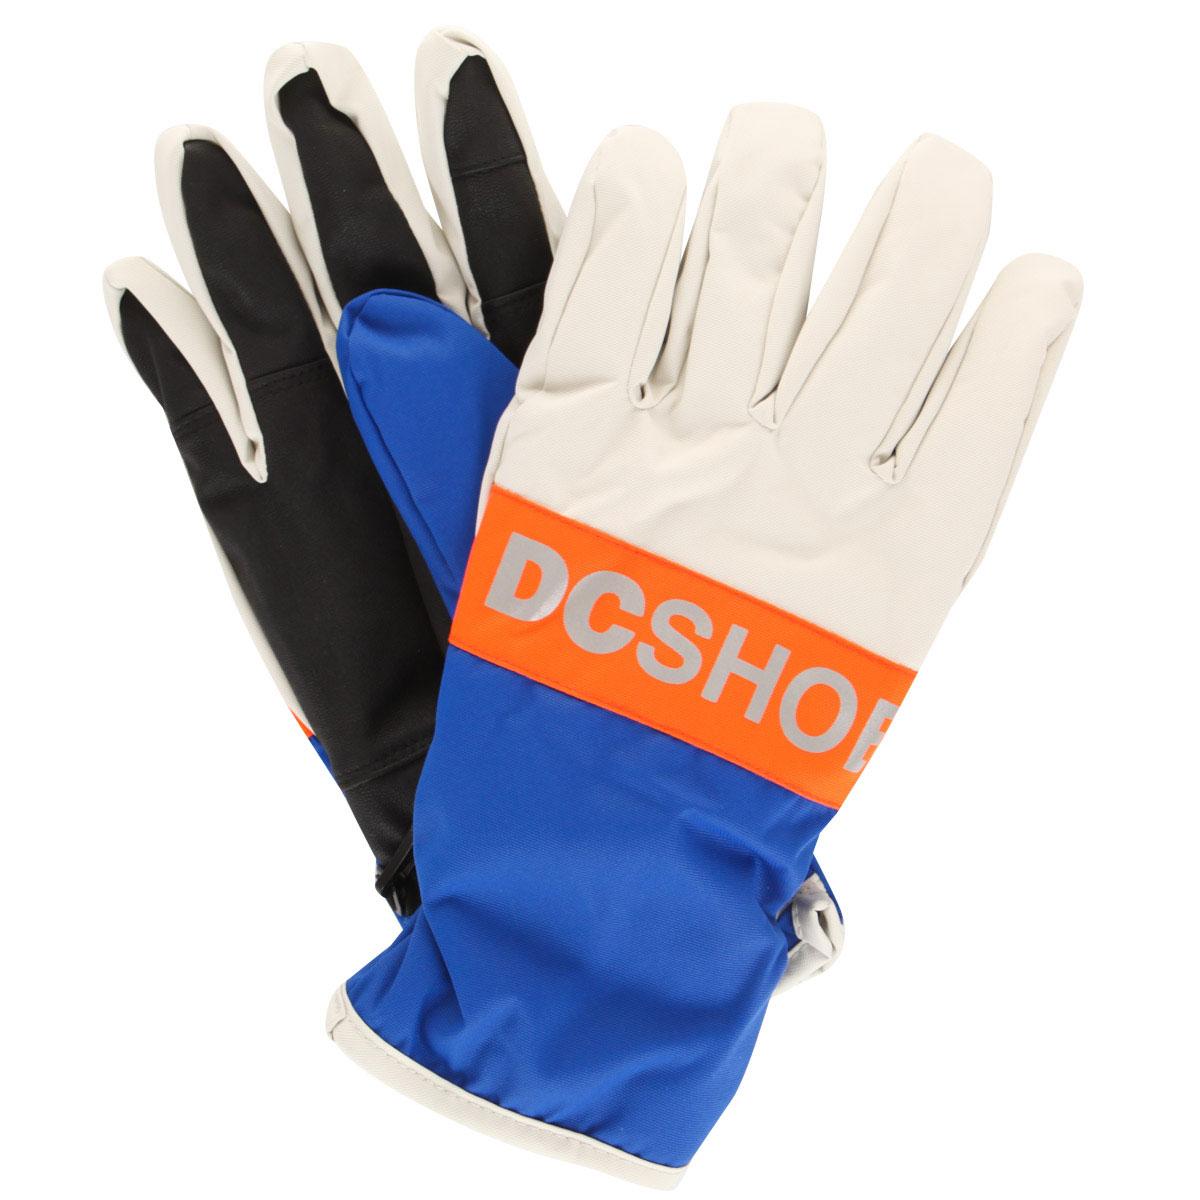 1eb6405b707a Купить перчатки сноубордические DC Franchise Glove Surf The Web ...